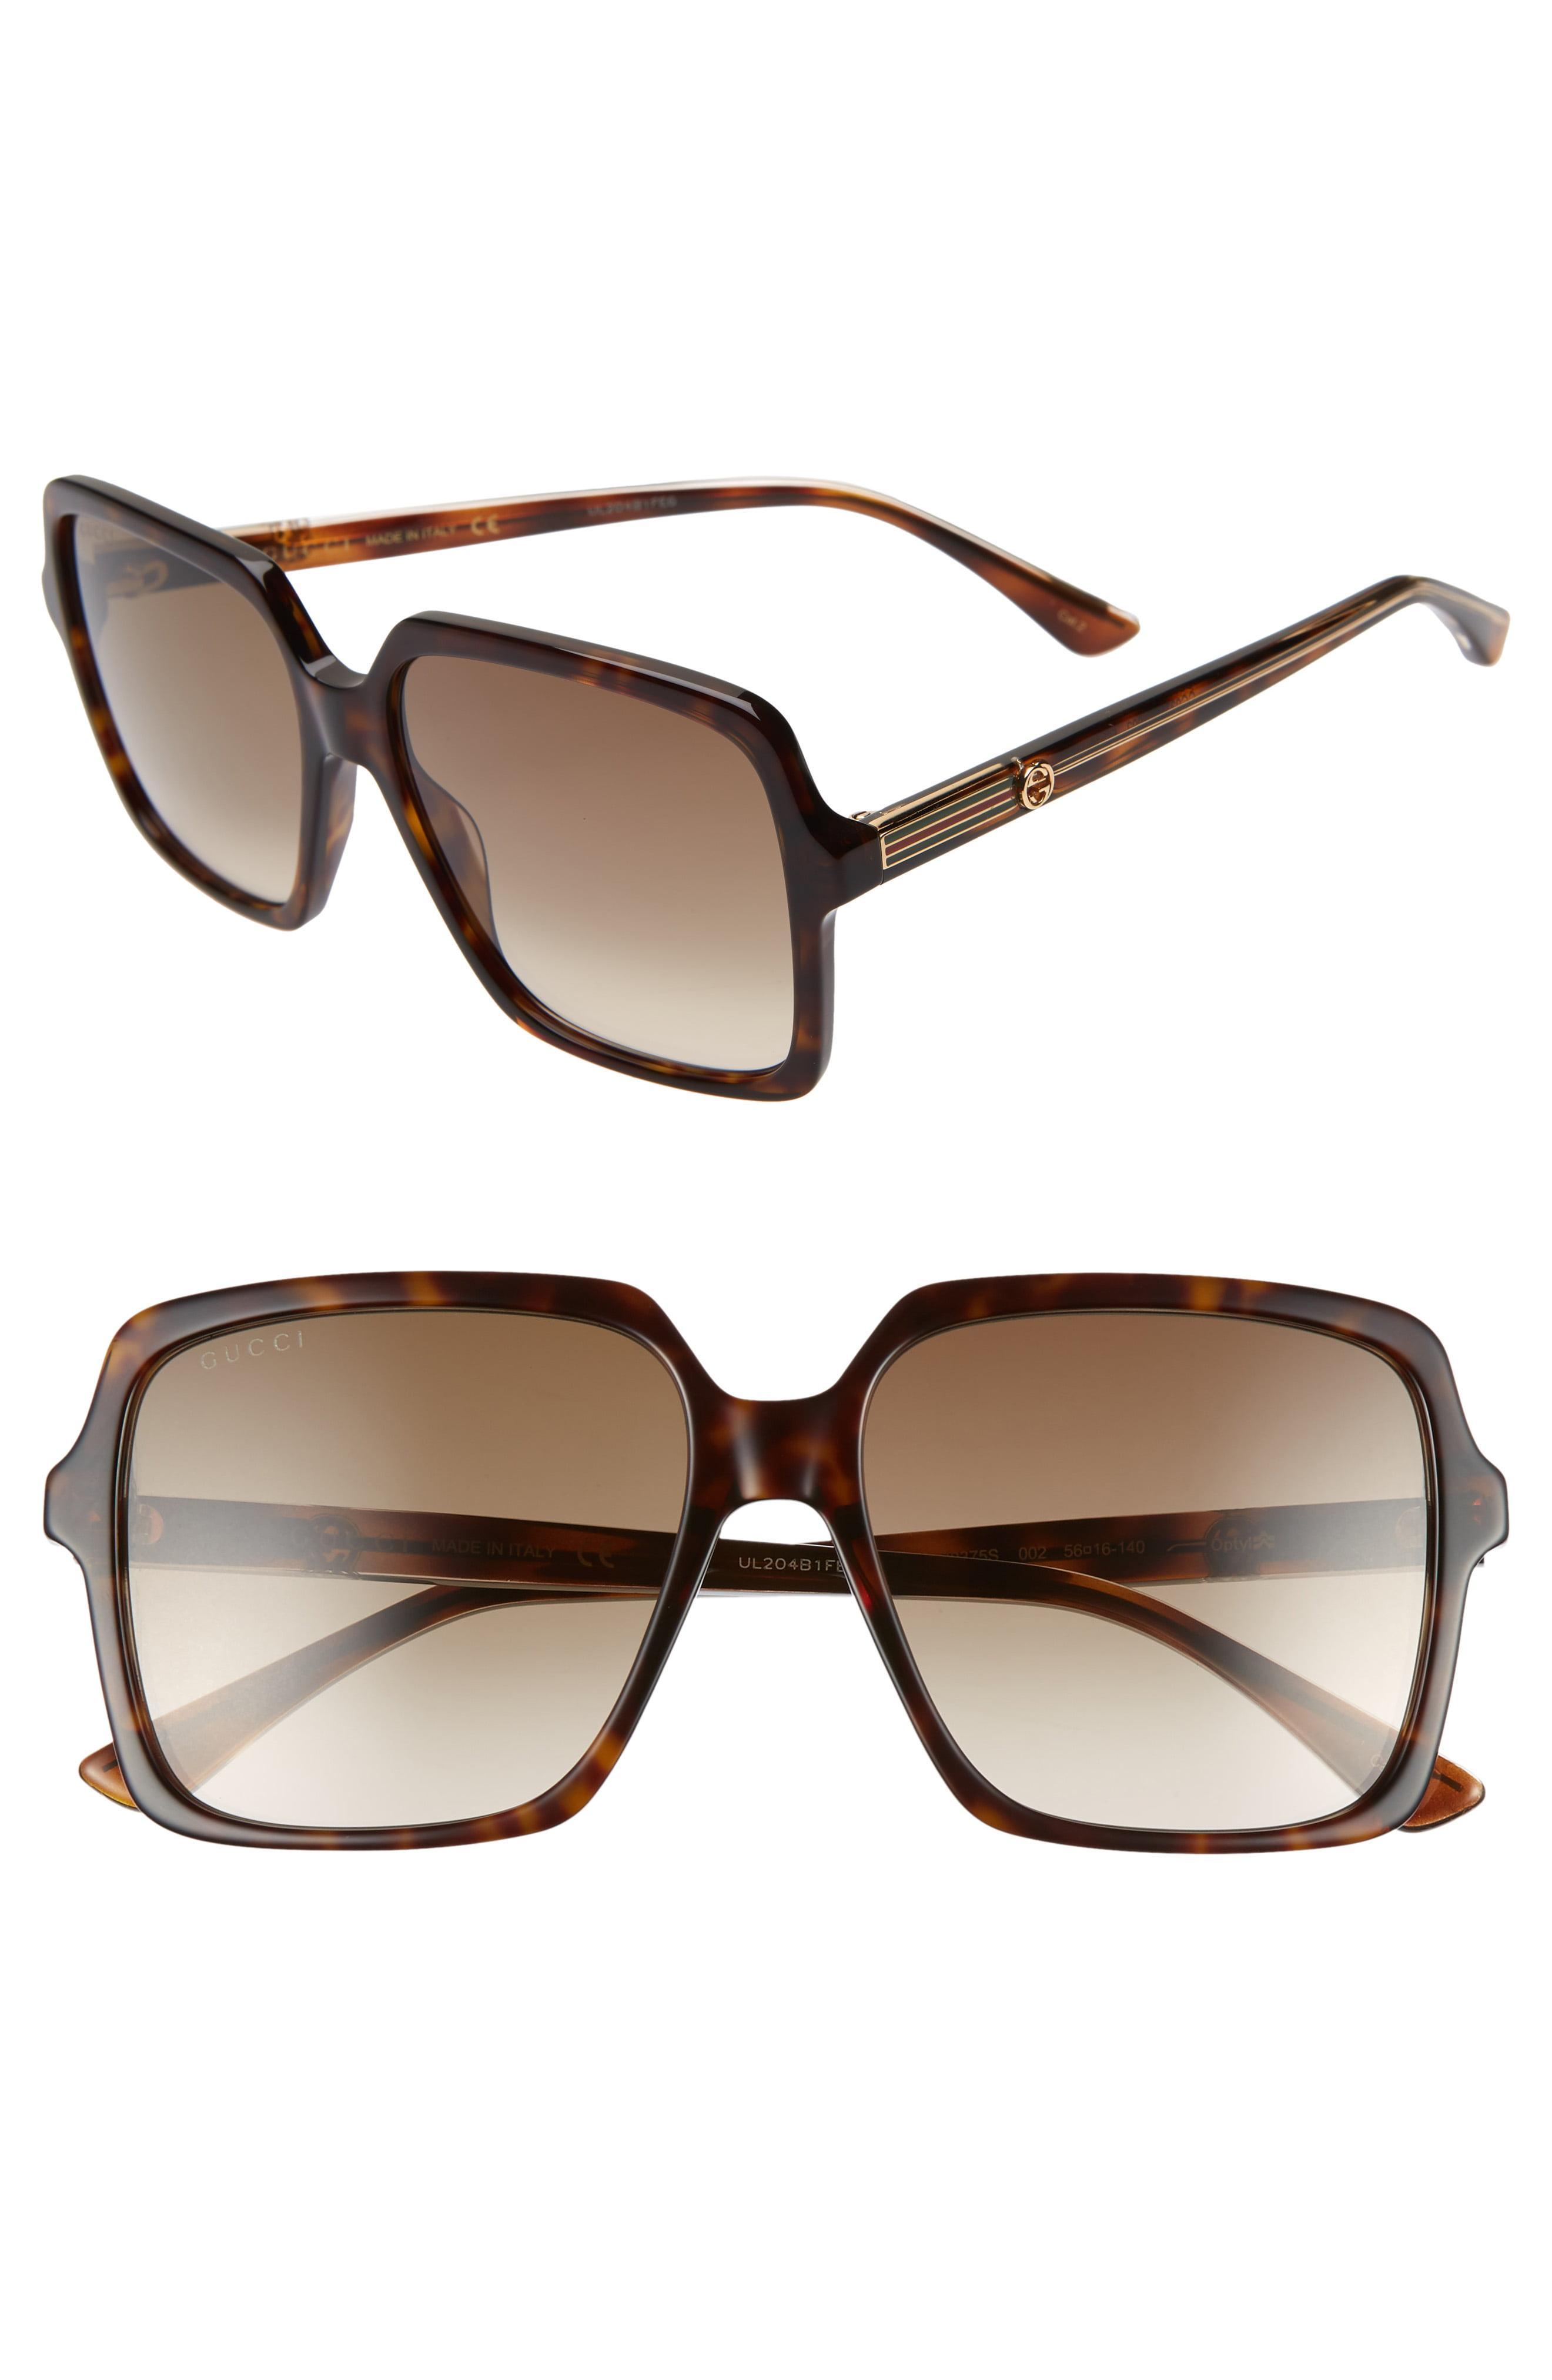 e0c204038f236 Gucci - 56mm Square Sunglasses - Dk Havana cry brown Gradient - Lyst. View  fullscreen